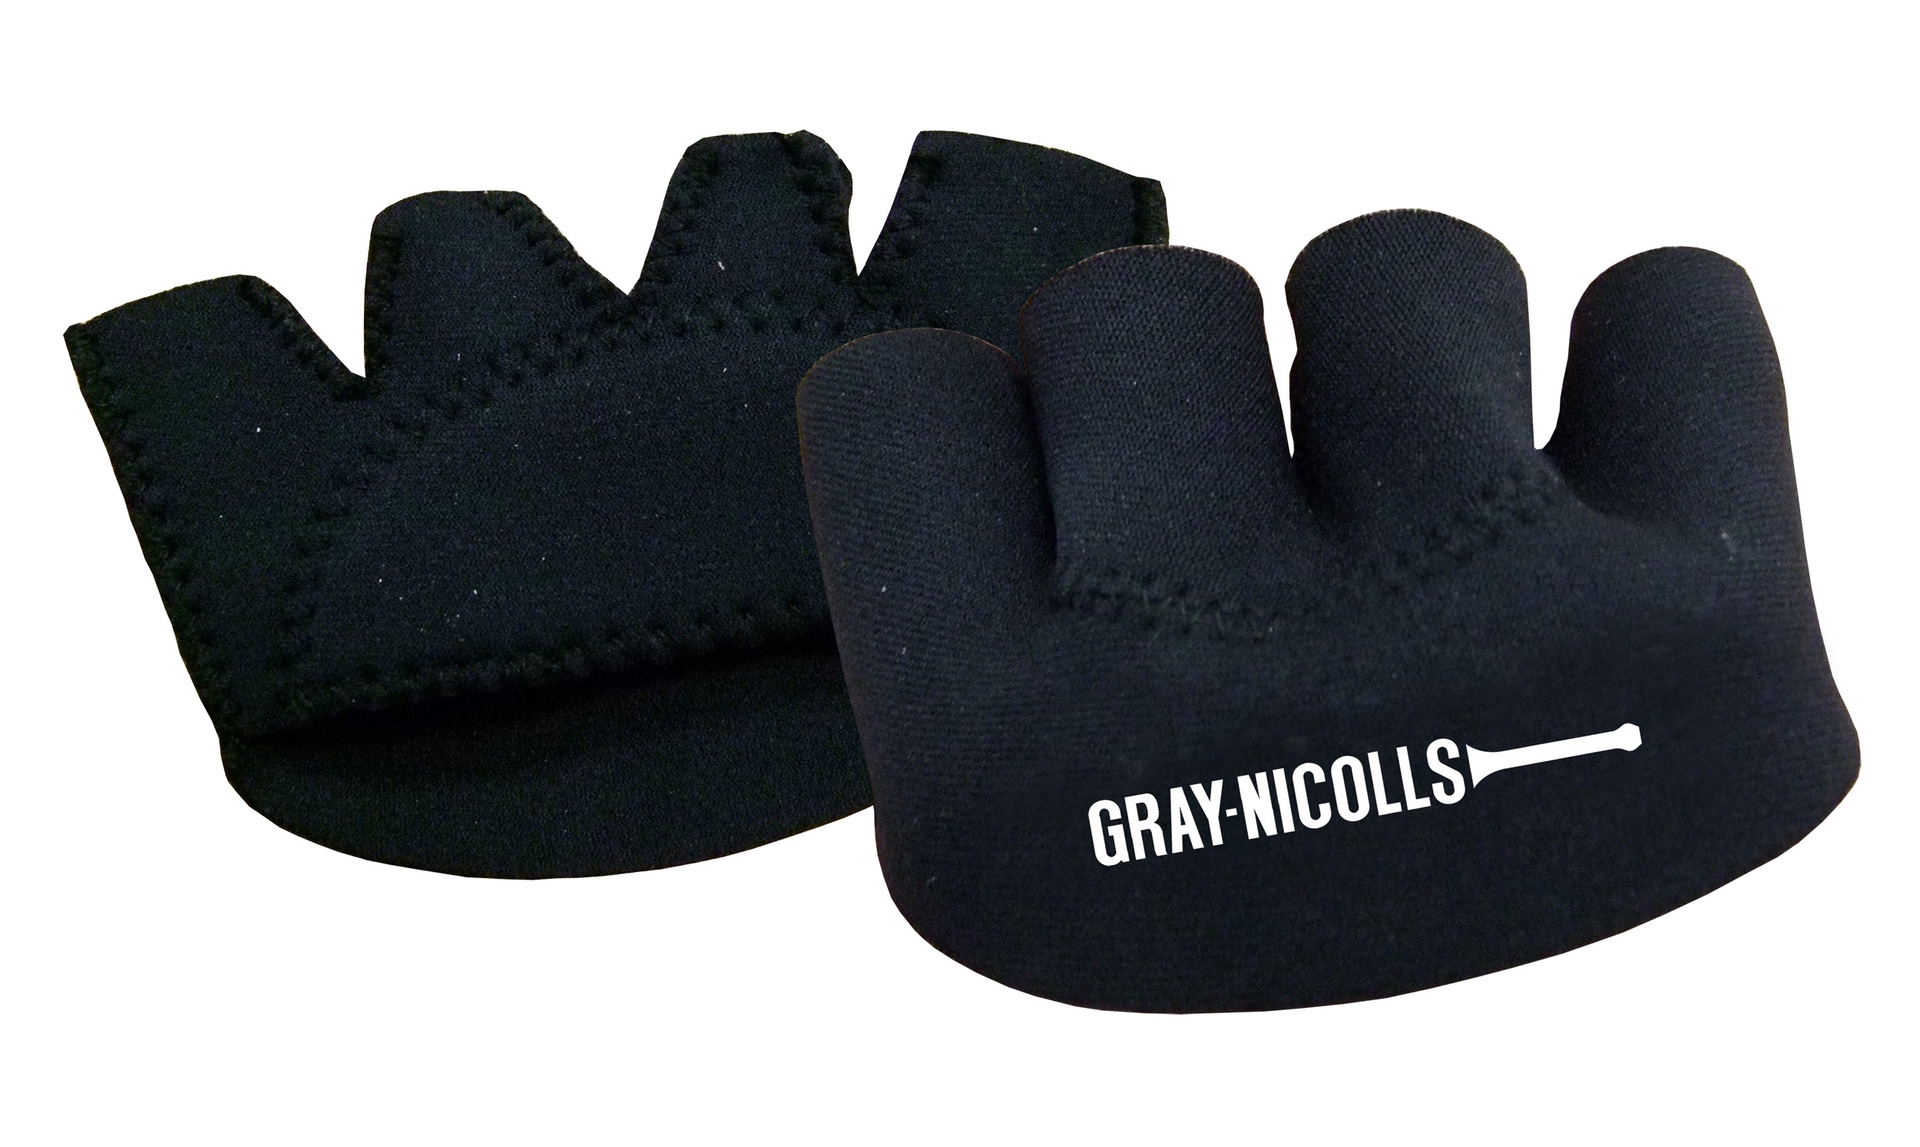 GRAY NICOLLS MCP Fielding Protection Gloves